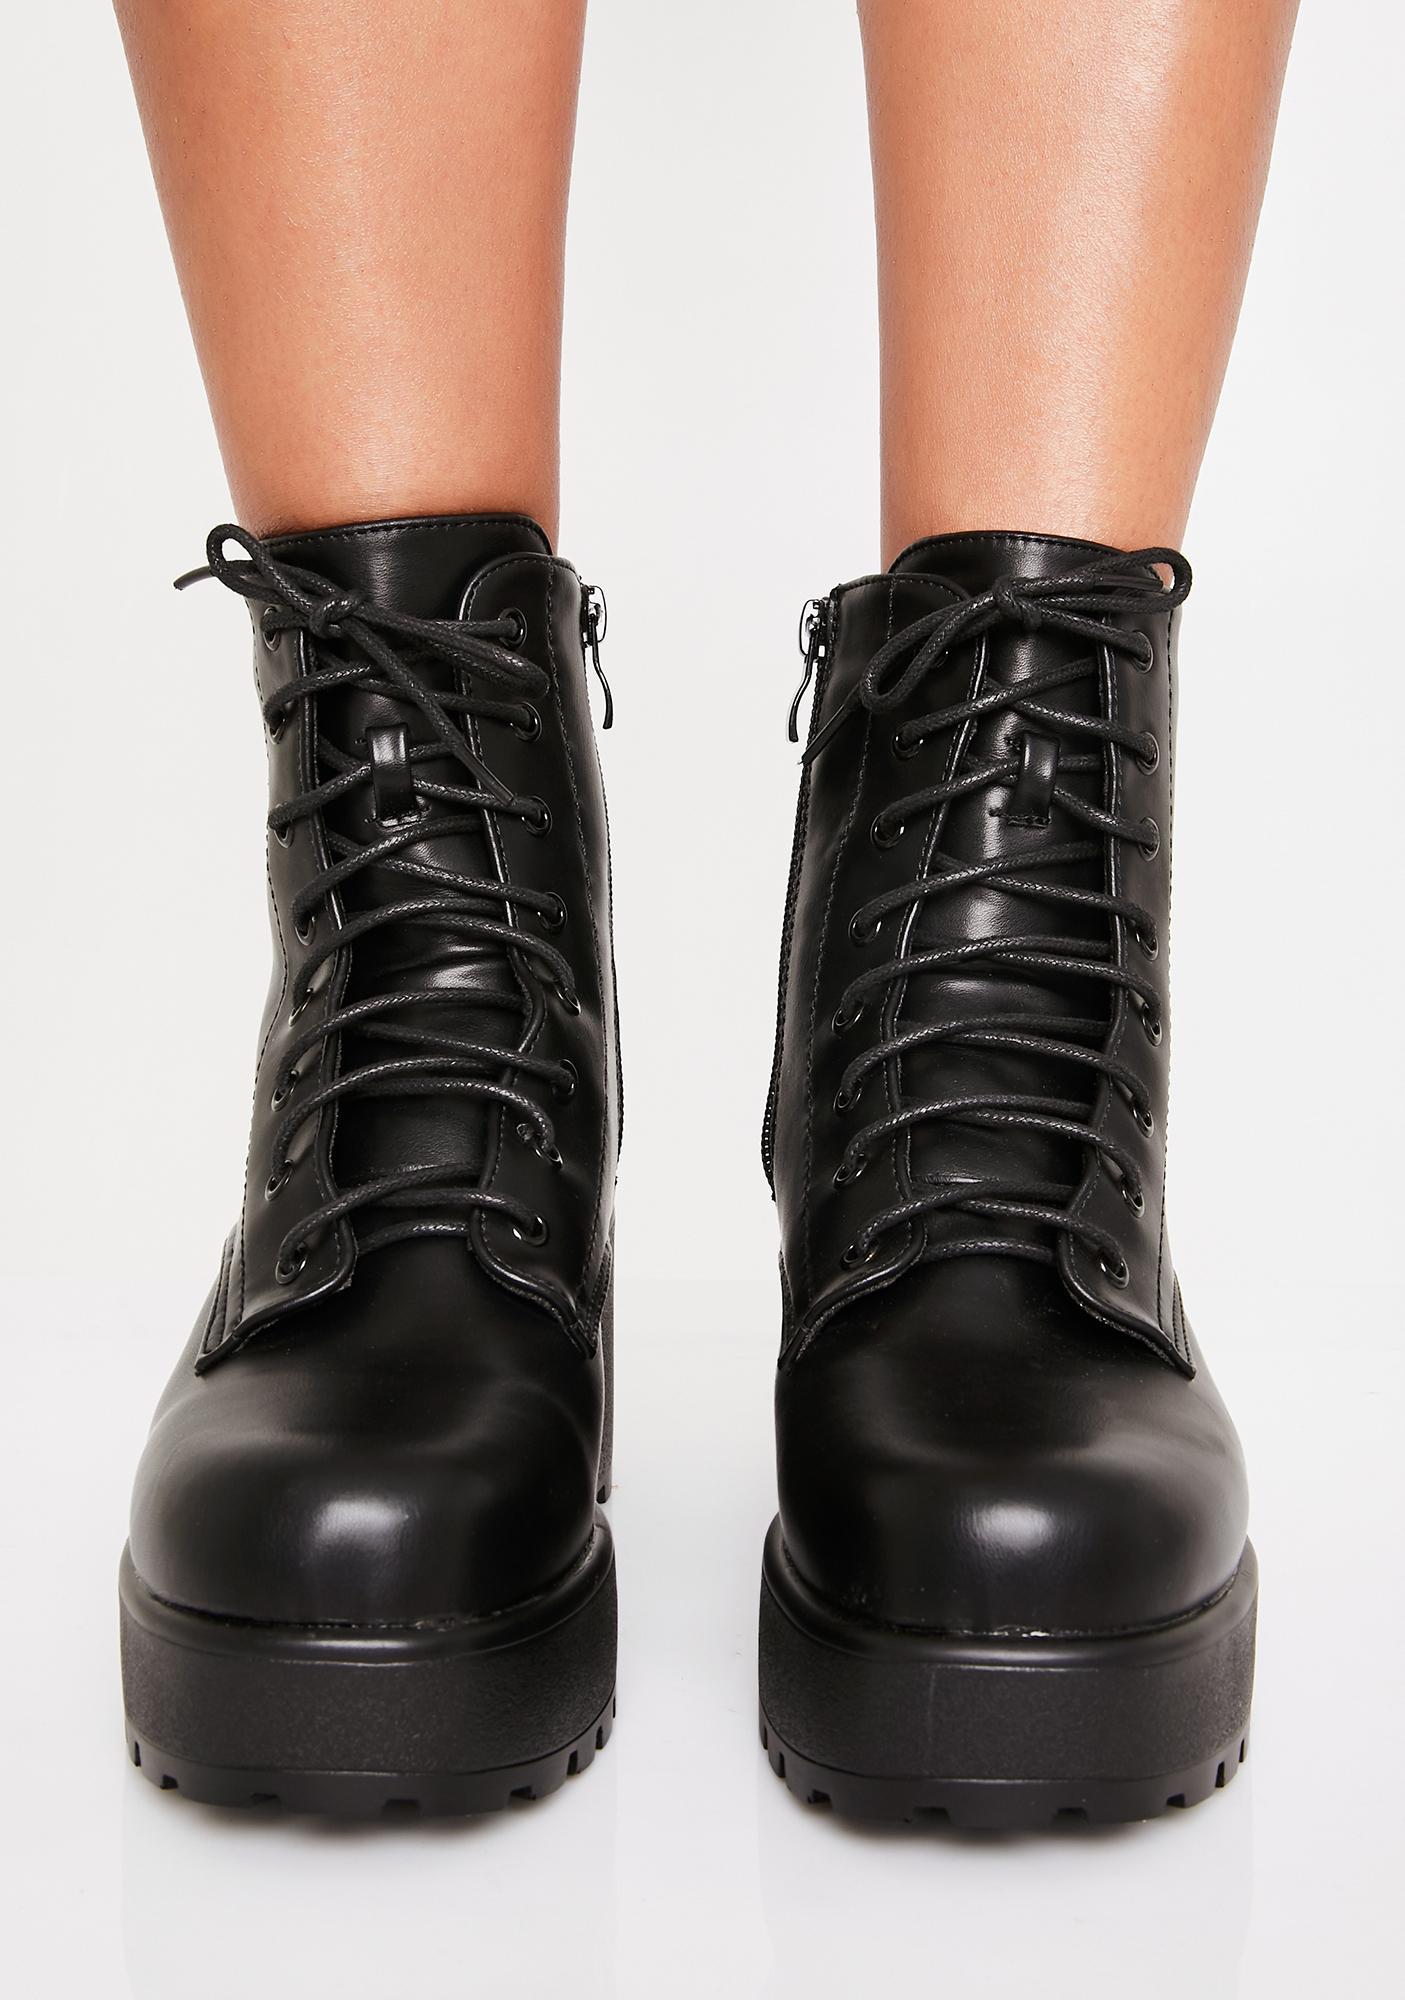 Koi Footwear Gin Platform Boots